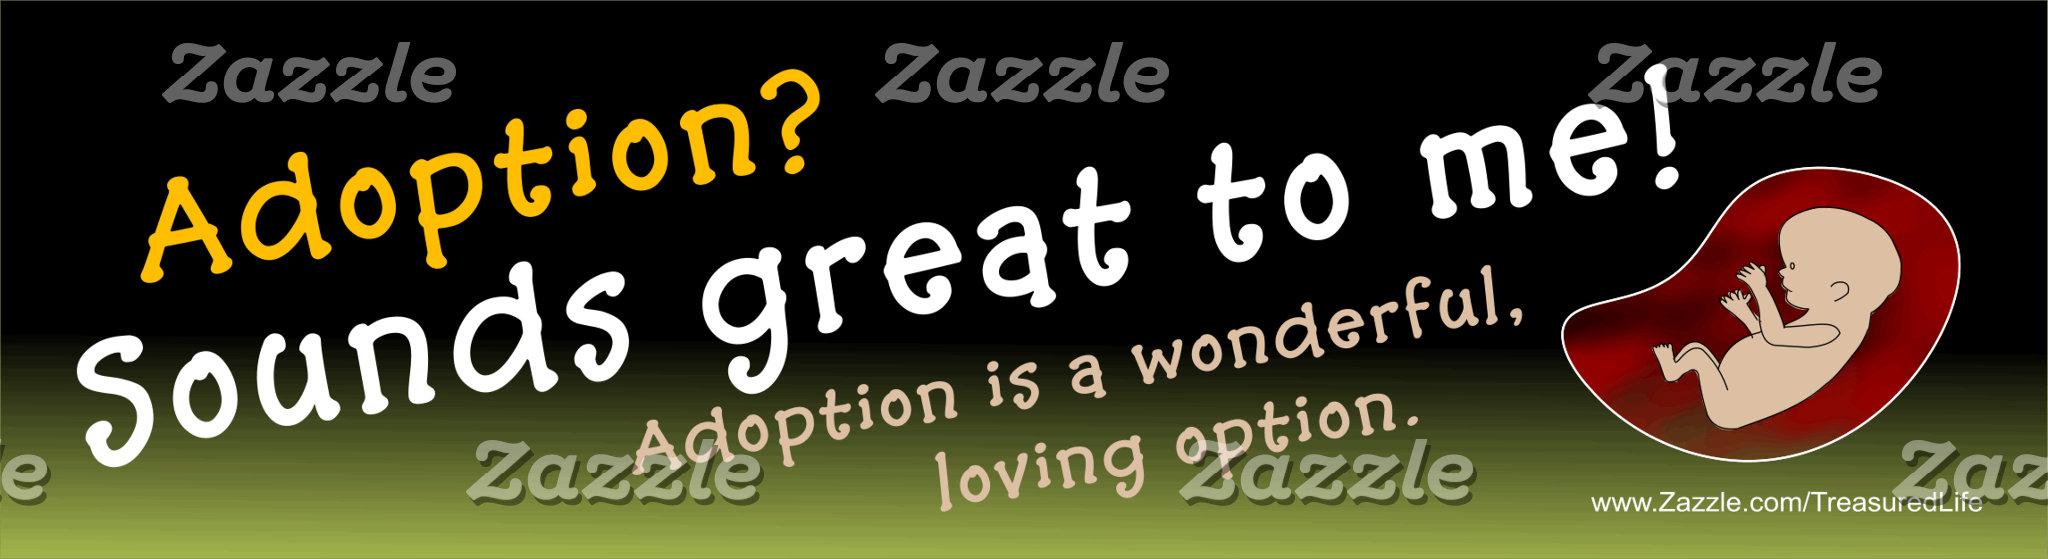 Adoption?